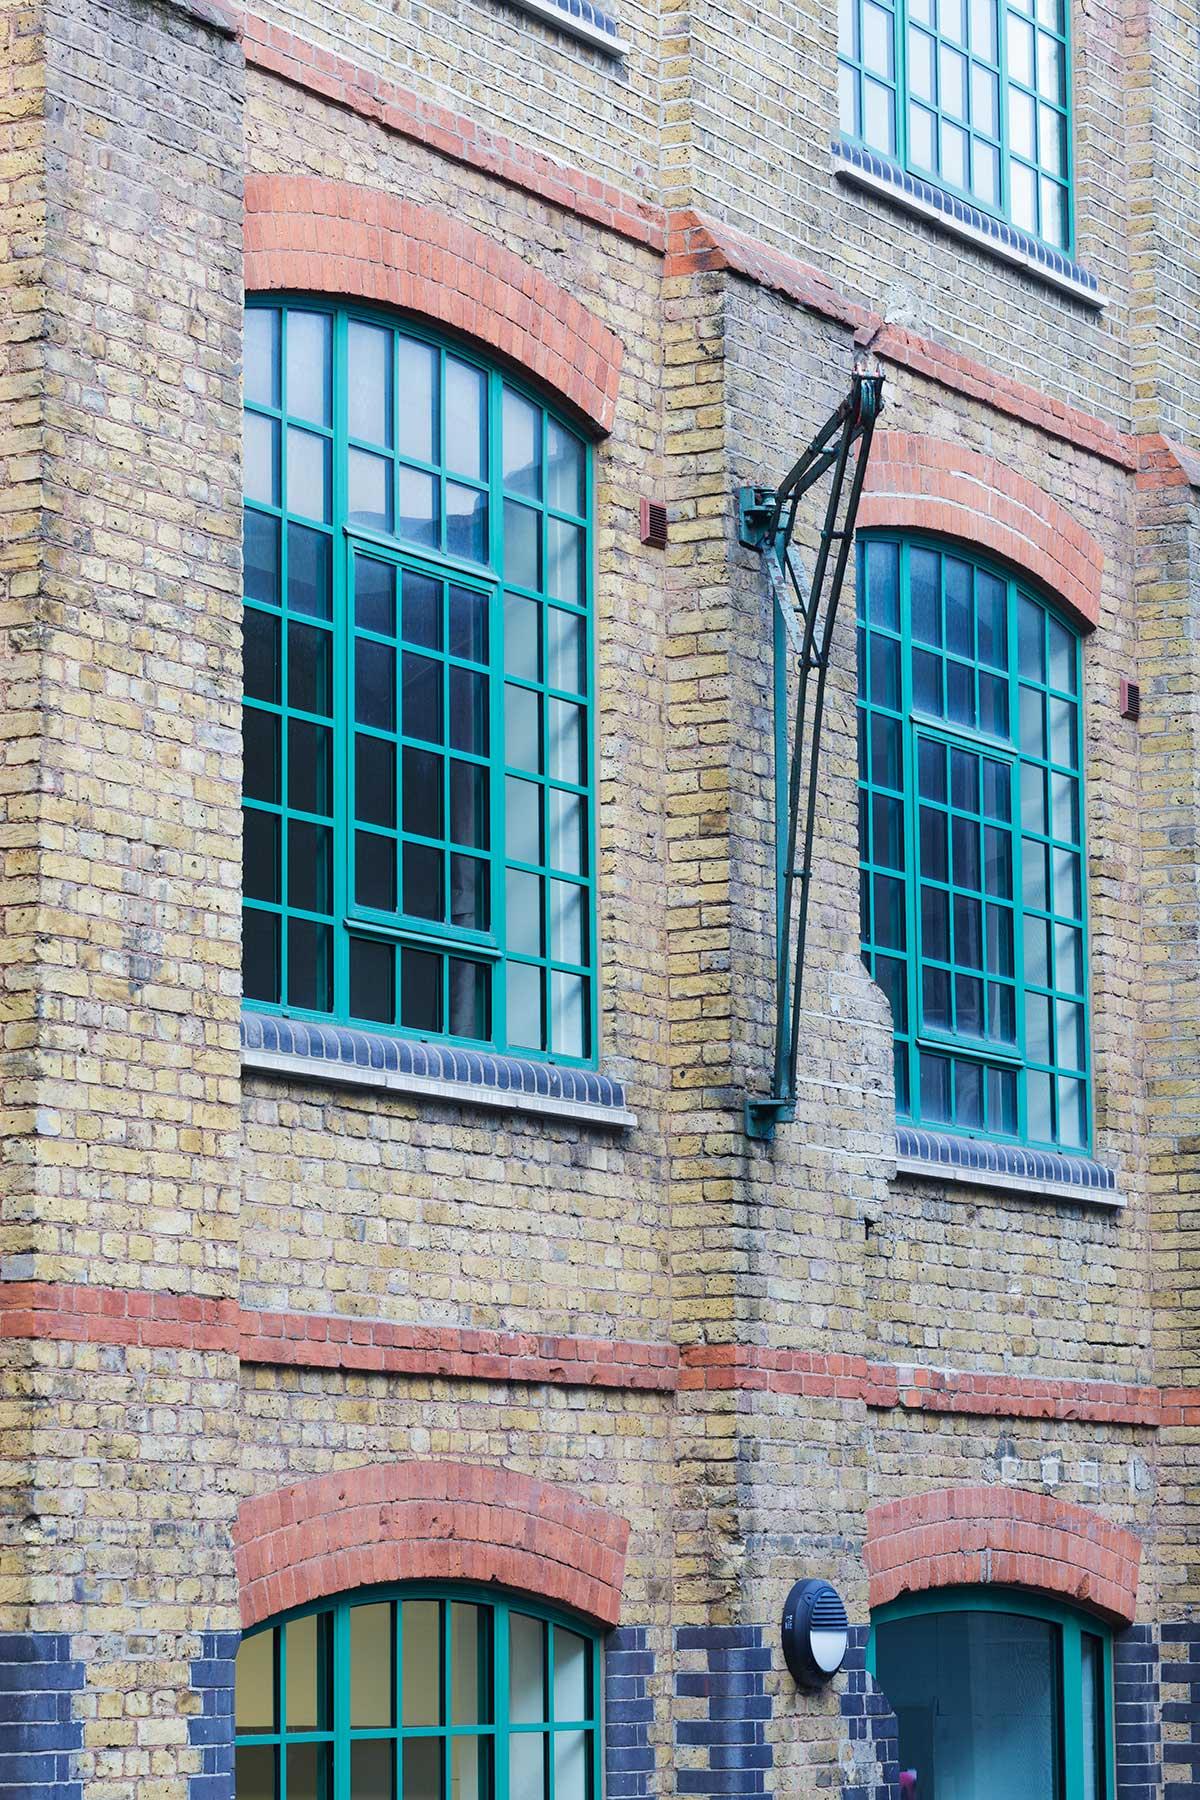 Steel Replacement Windows in Epsom